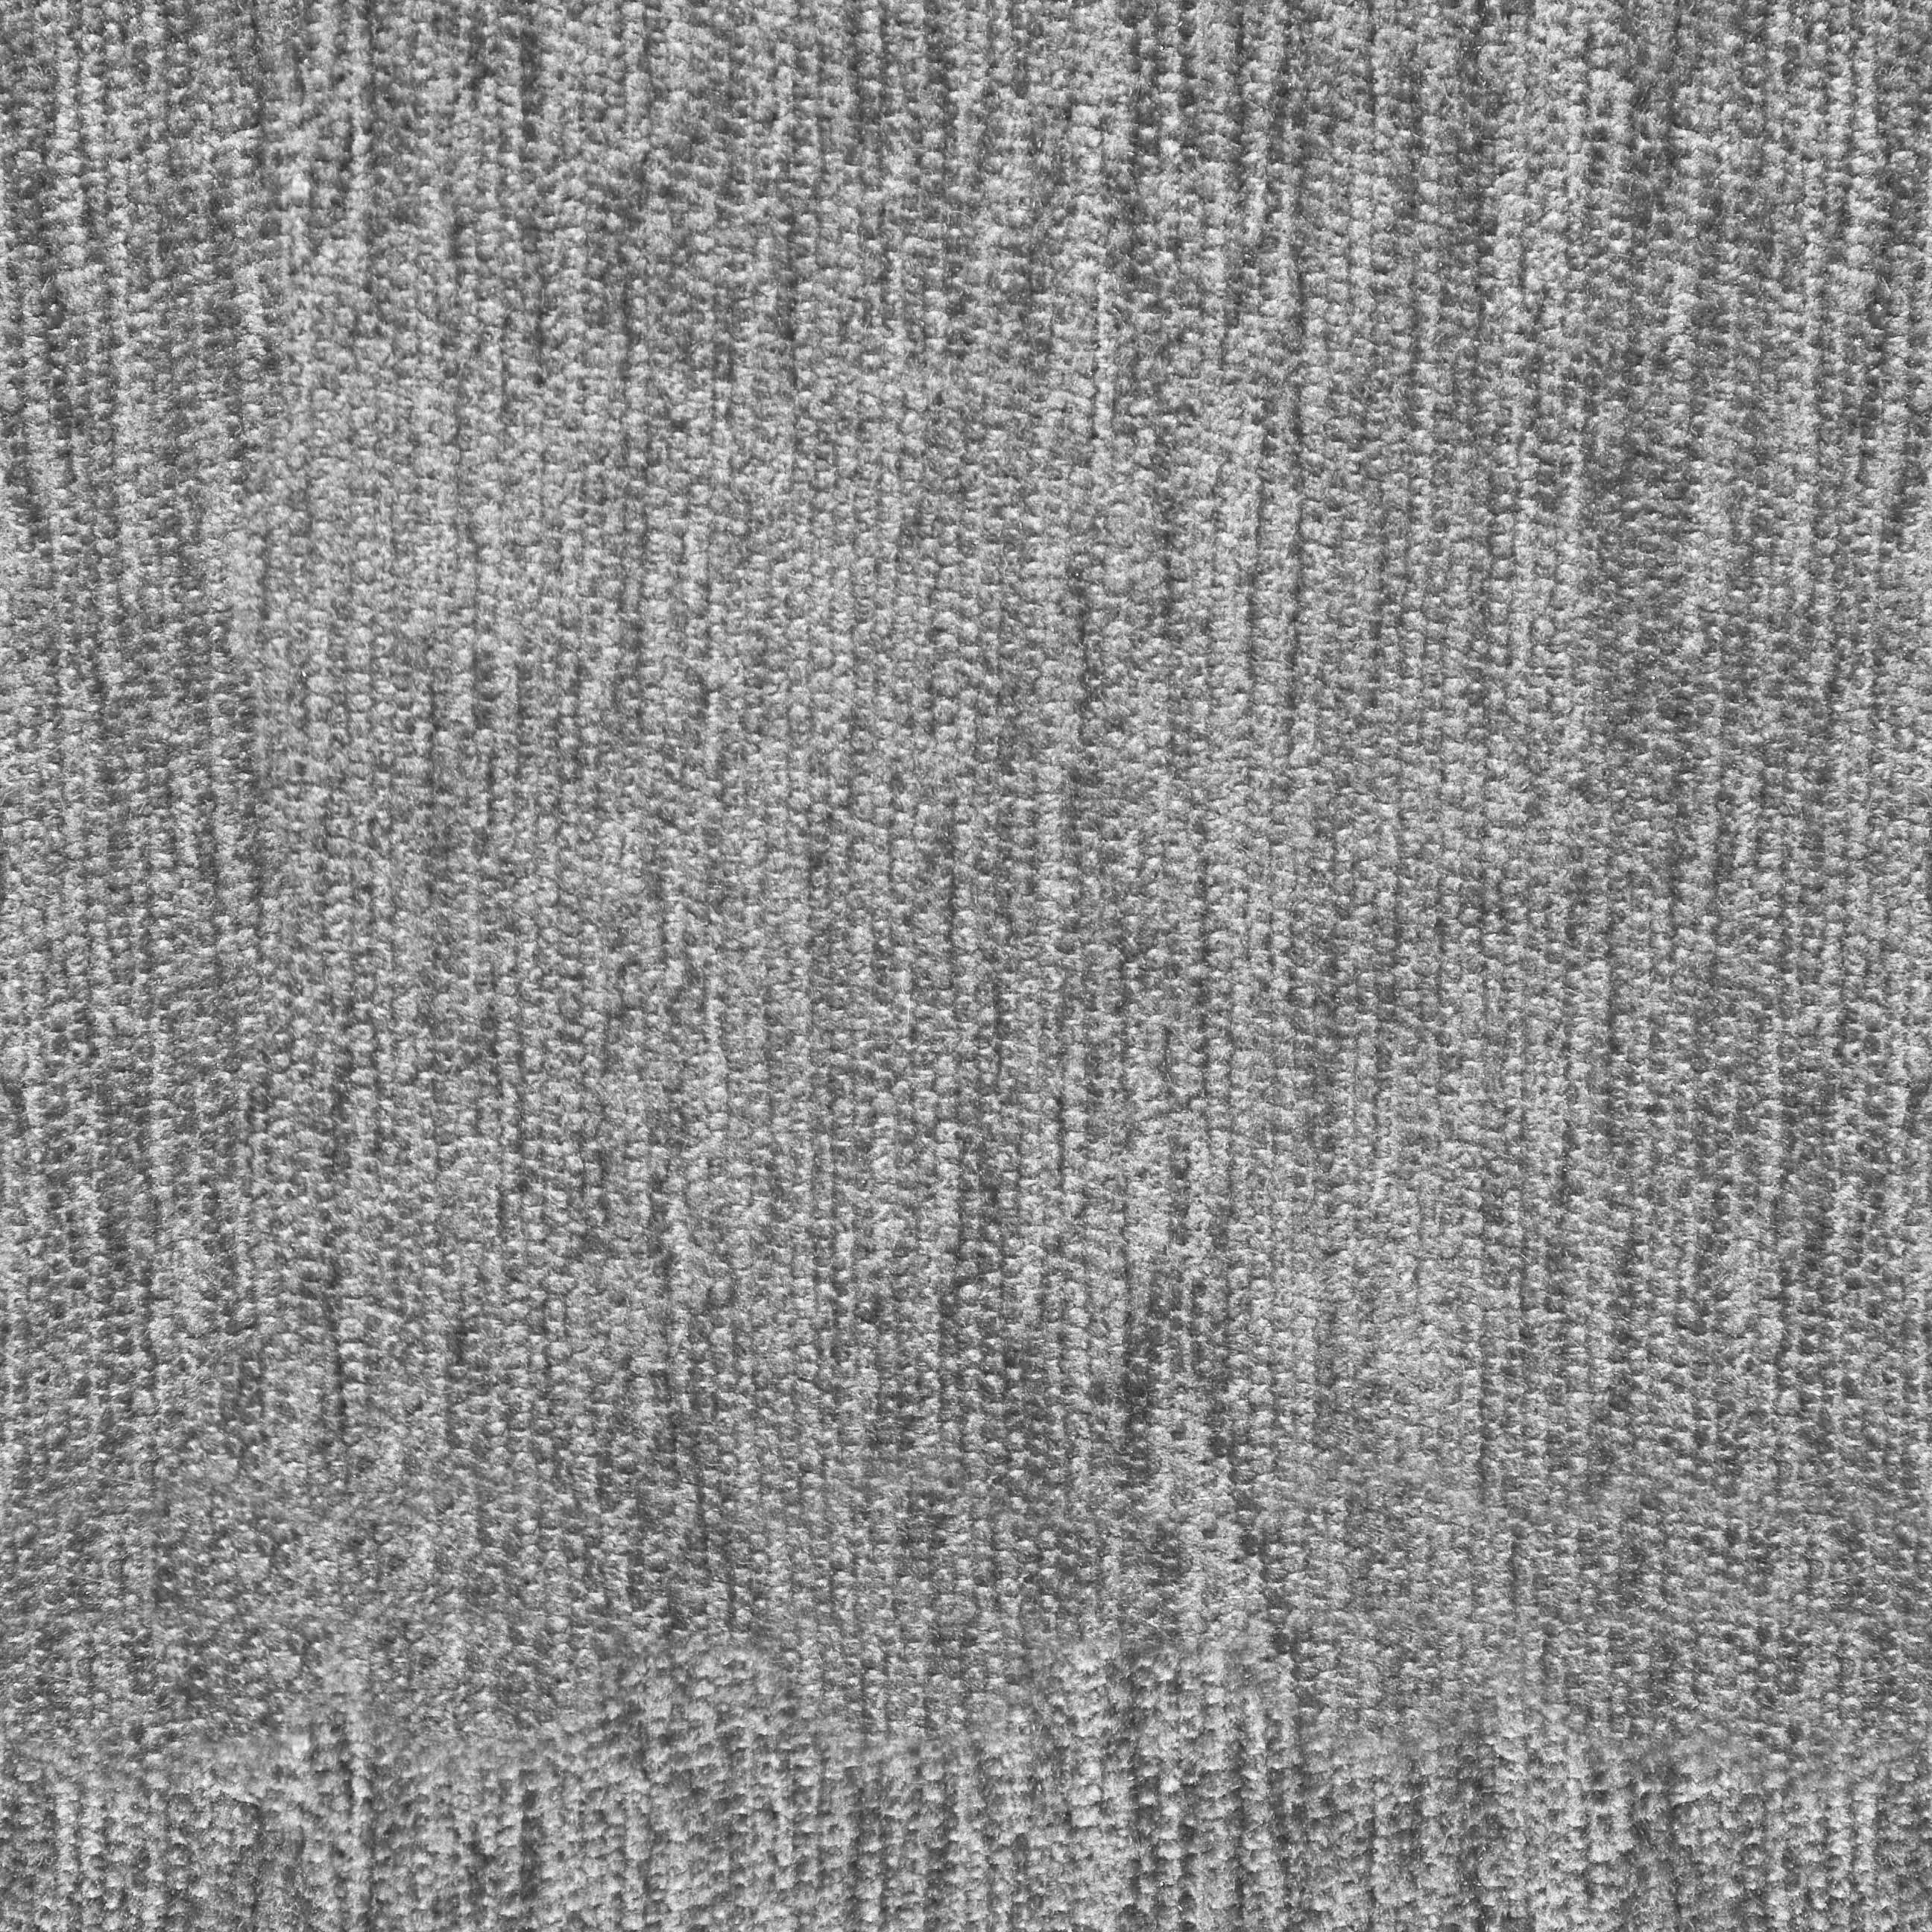 seamless-fabric-bump-map.jpg (2592×2592) | FURNITURE